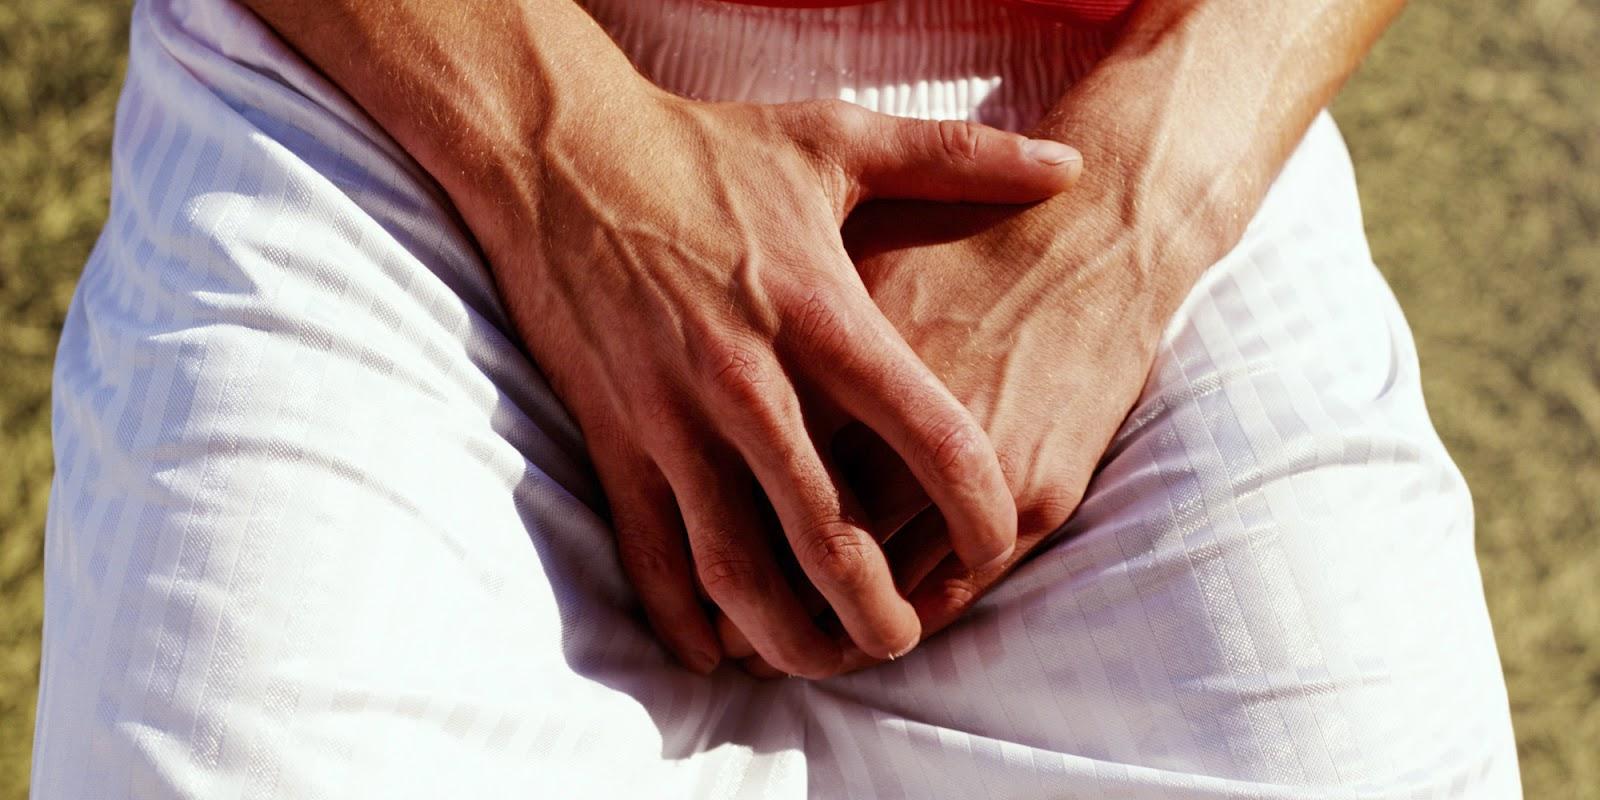 Почему болит правое яичко у мужчины боли при